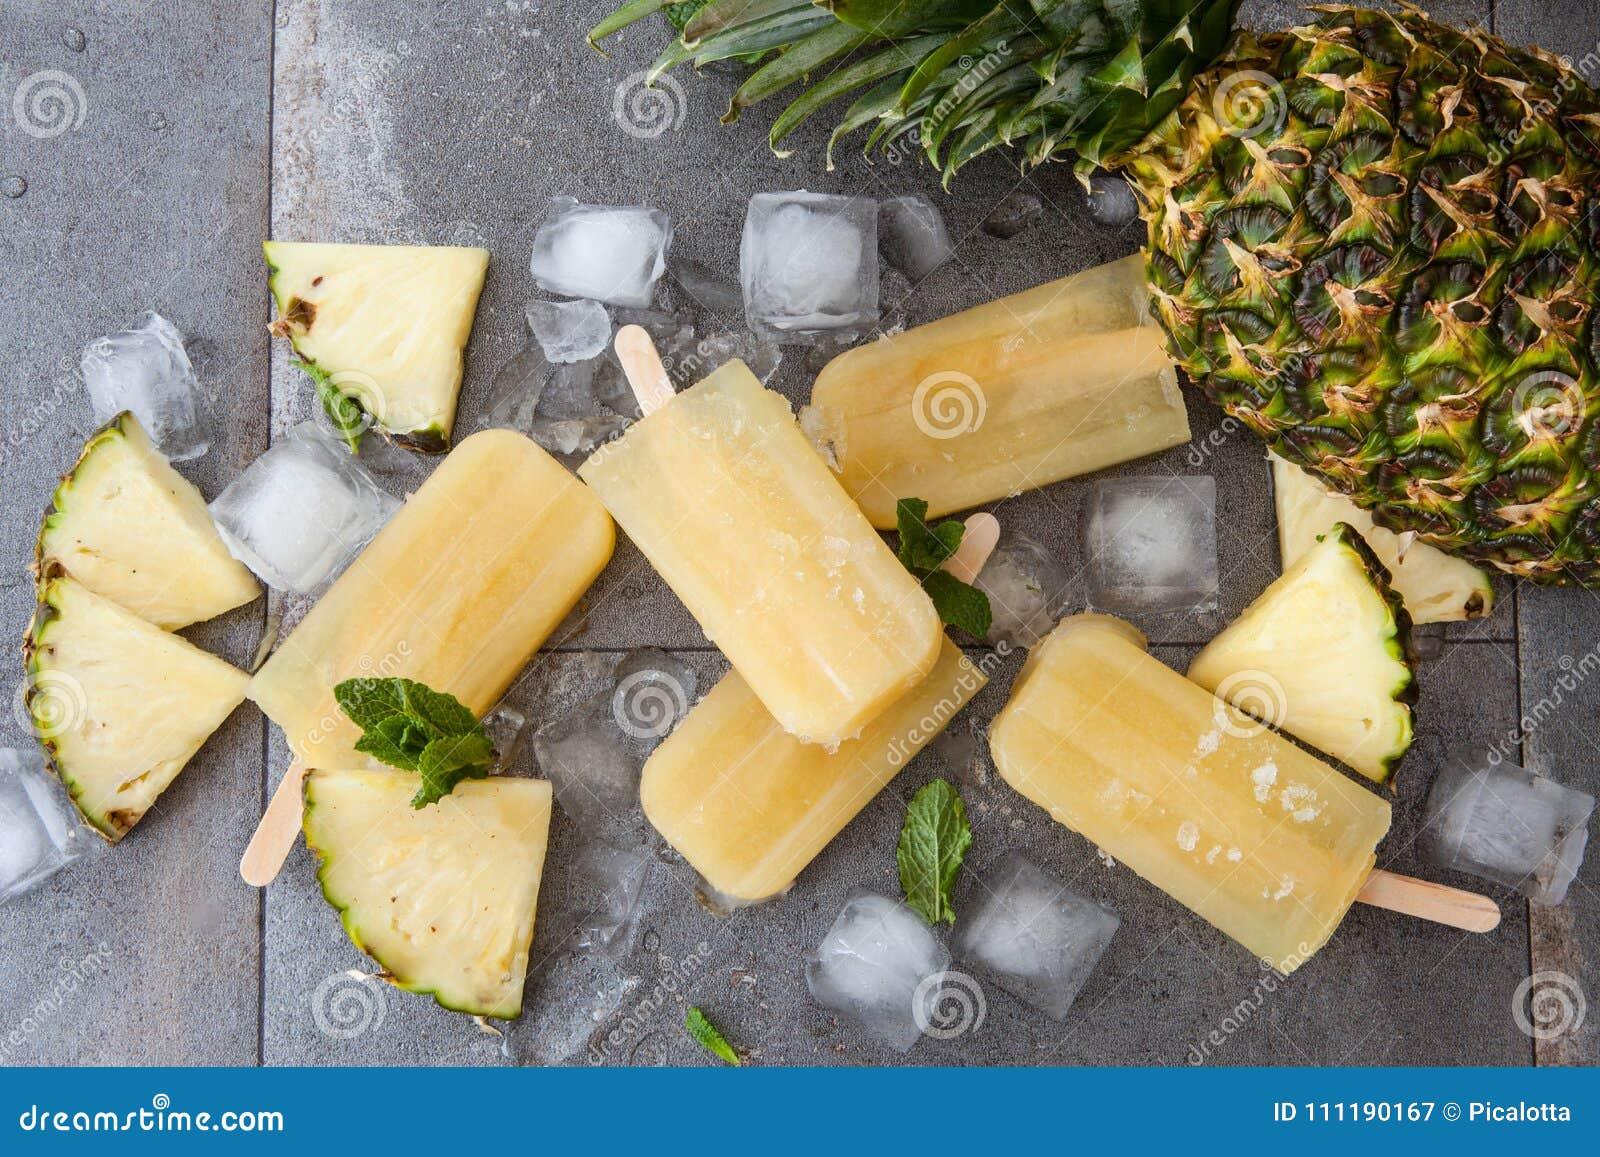 Homemade Pineapple Popsicles Stock Image - Image of lollipops